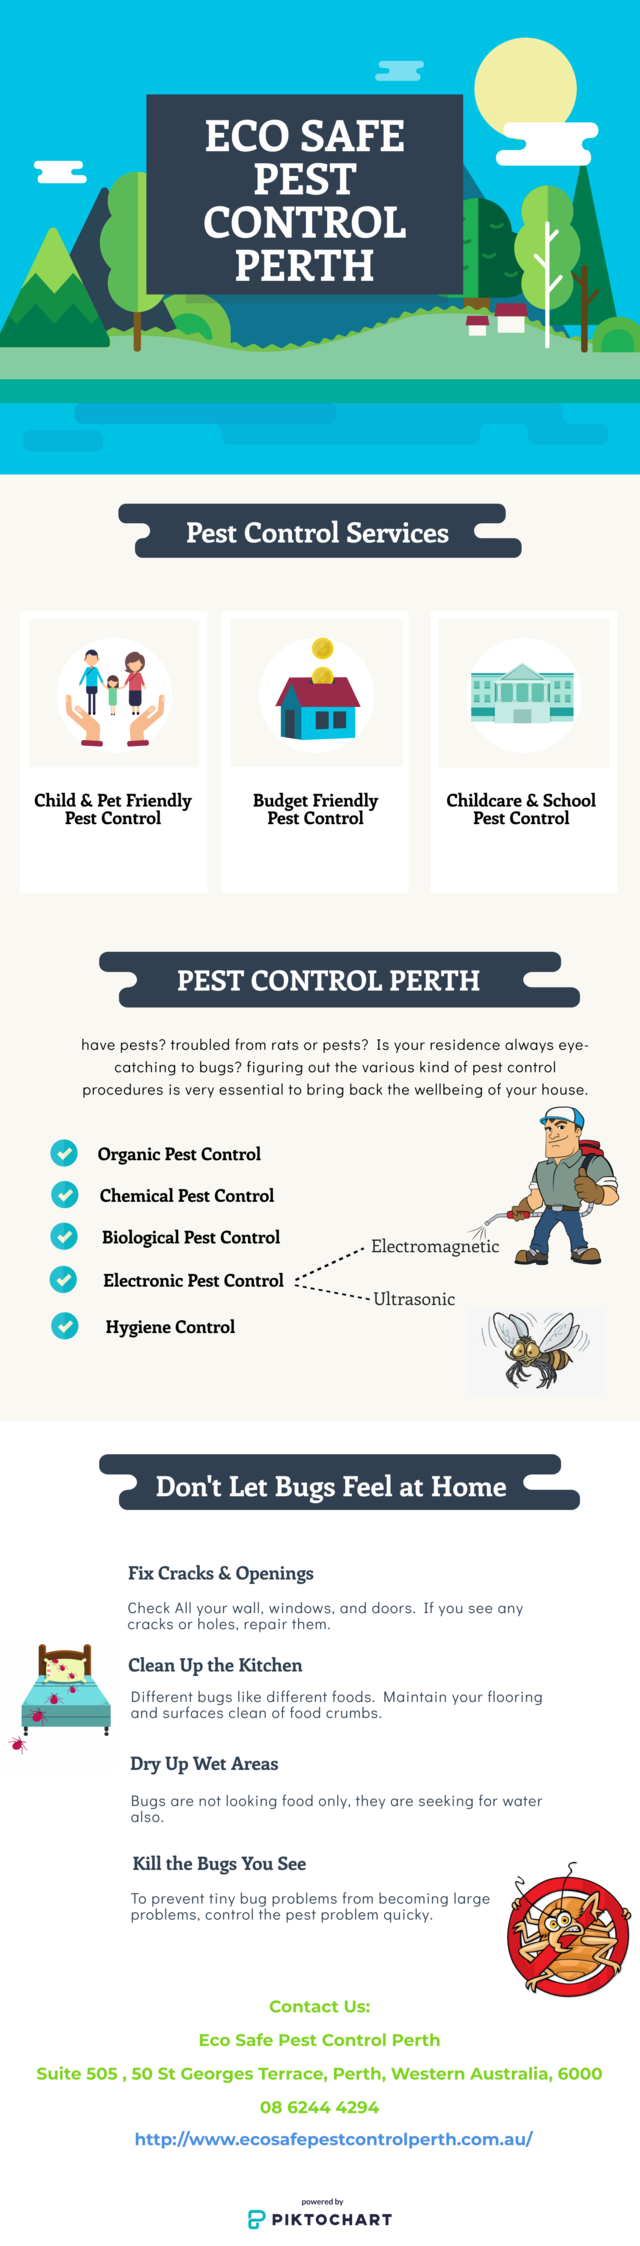 Pest control perth infographic